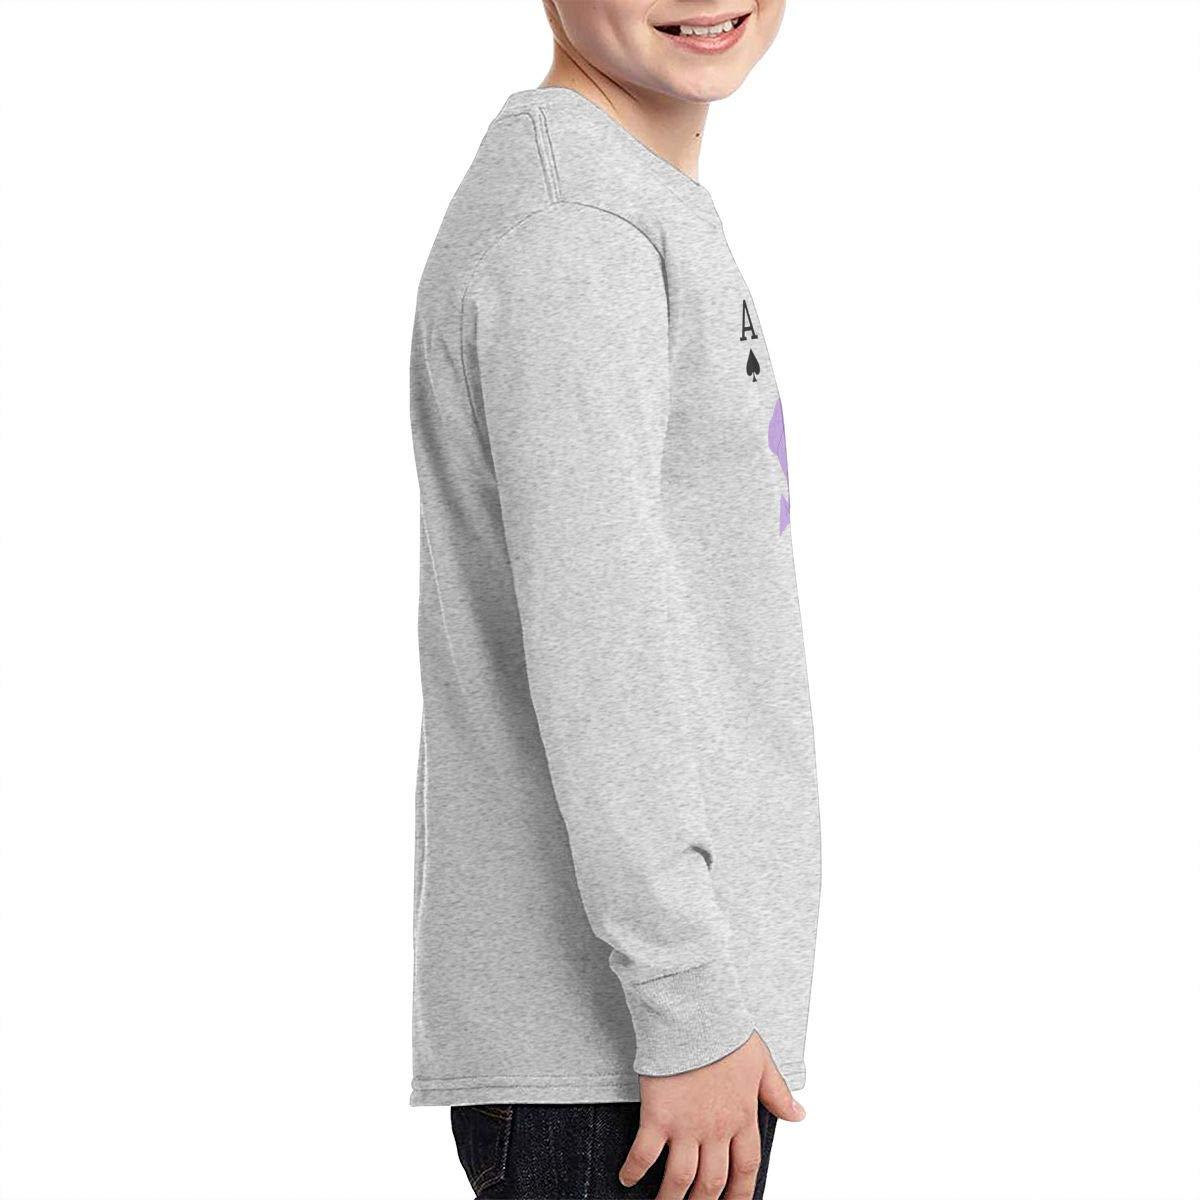 Hisoka Card Boys Long Sleeve T-Shirt,Fashion Youth Tops